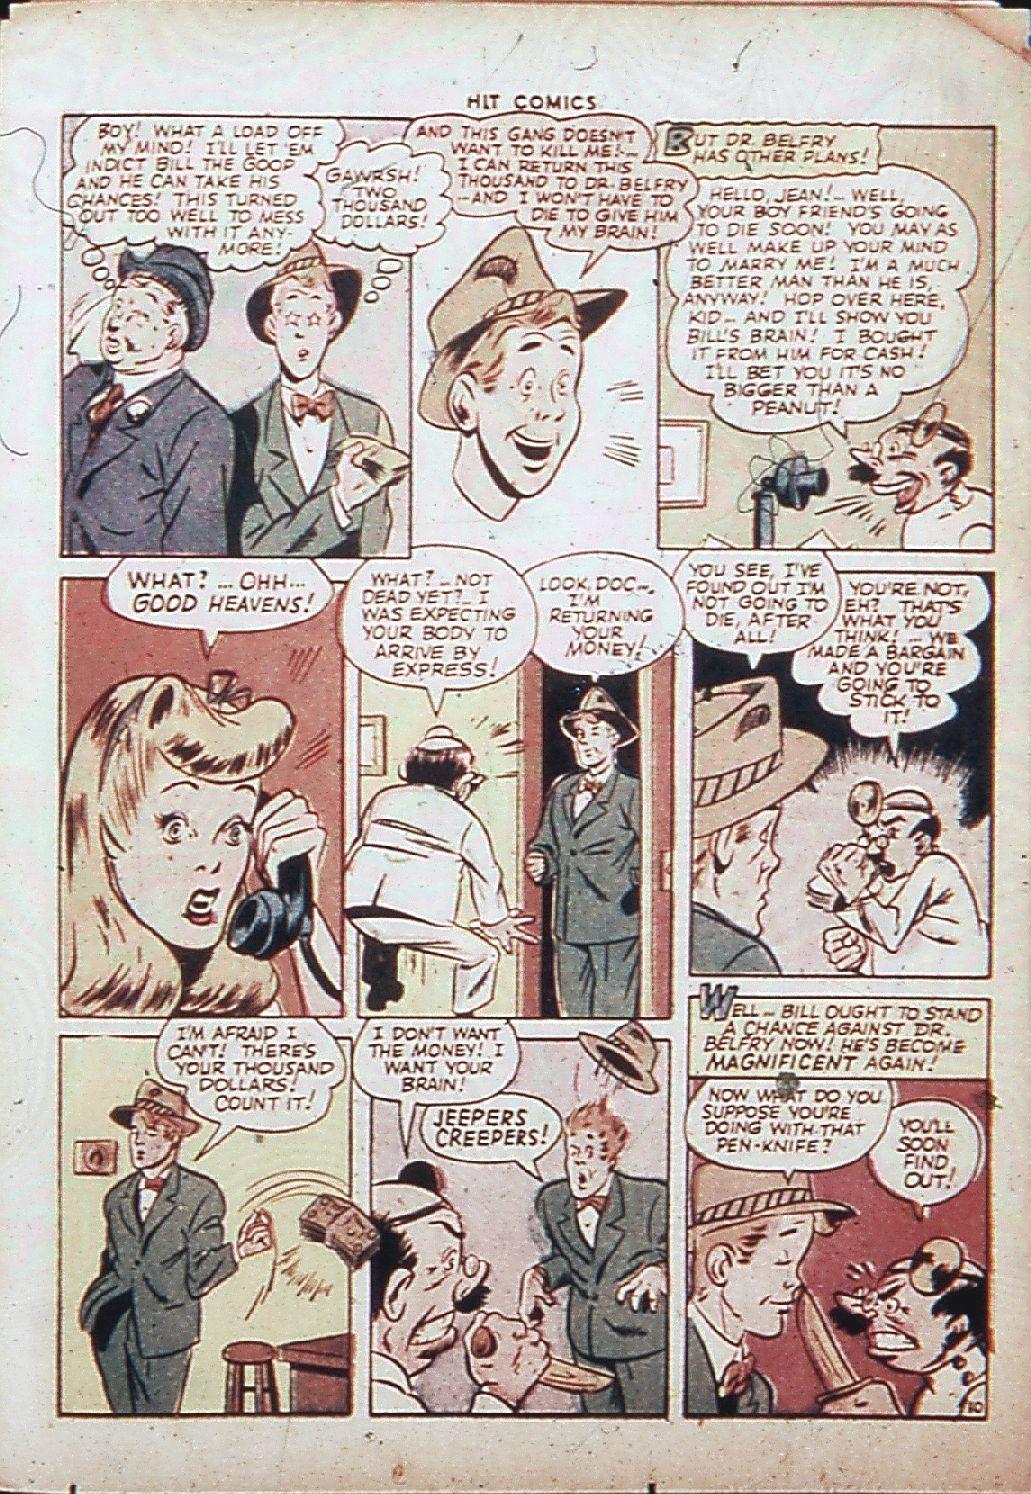 Read online Hit Comics comic -  Issue #30 - 58